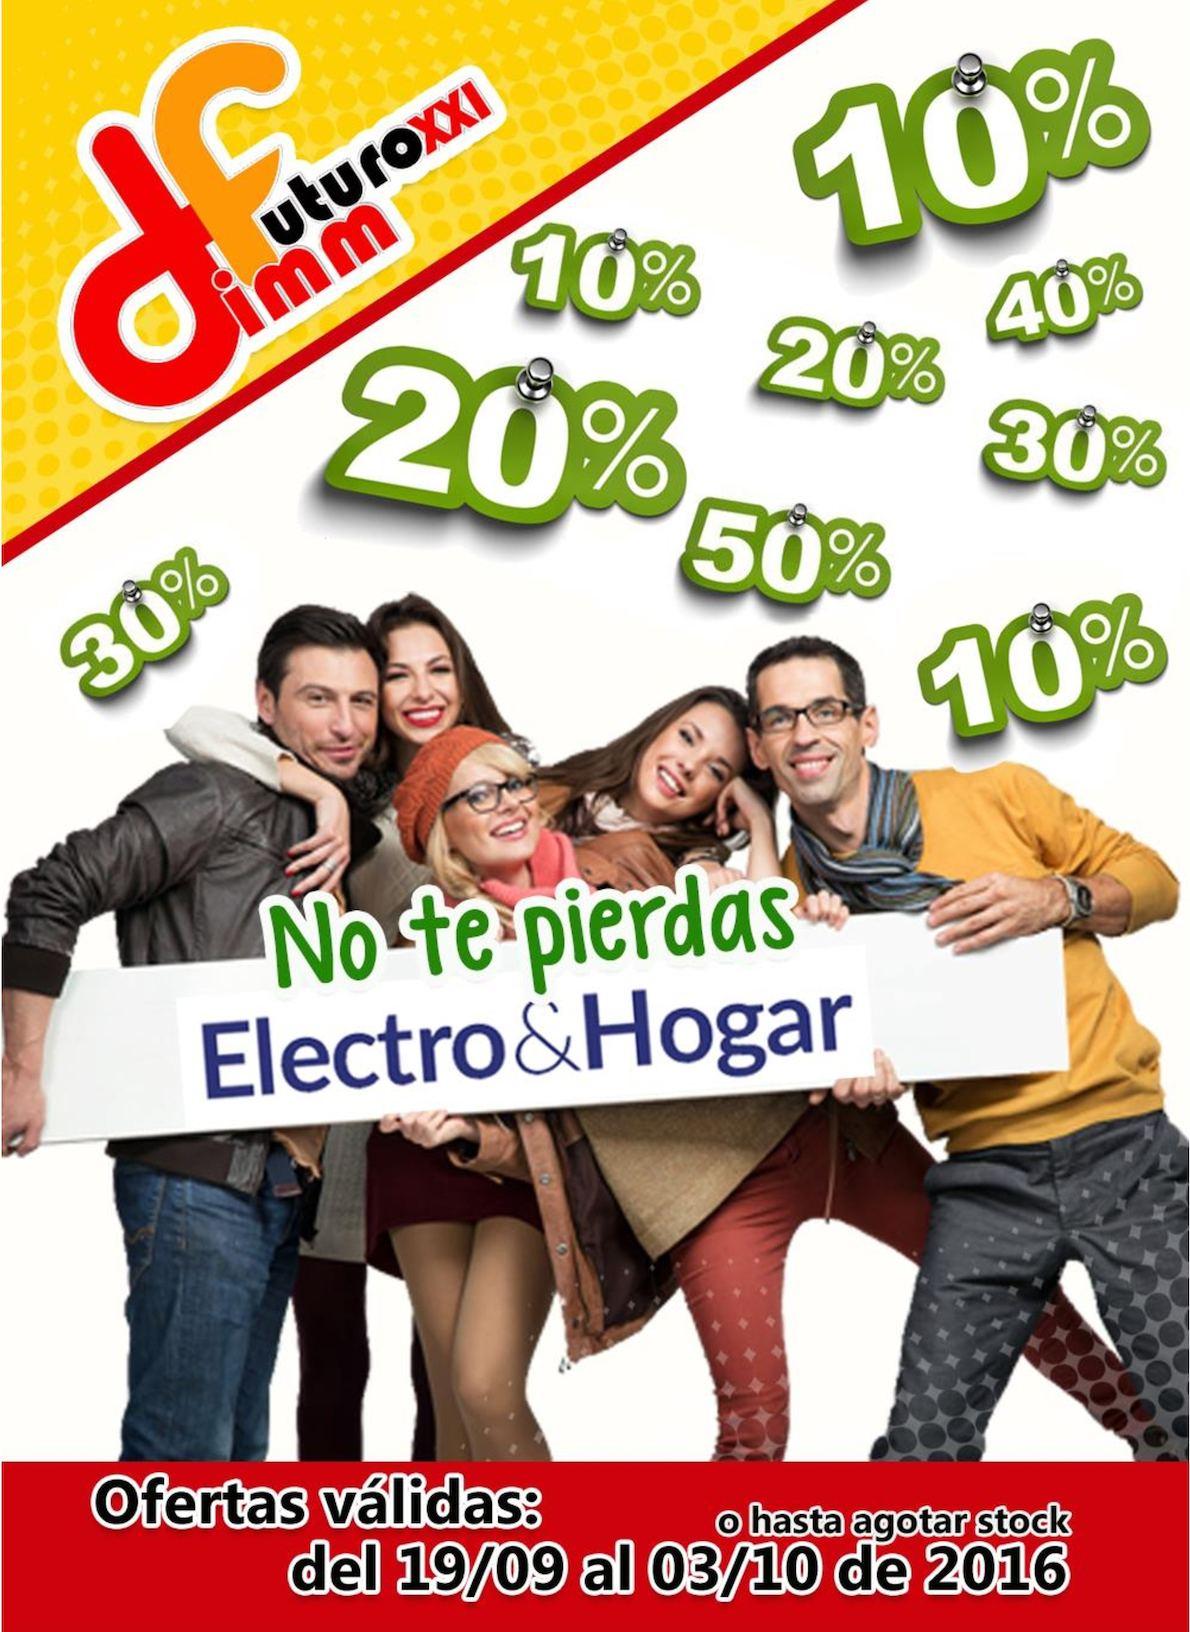 Catálogo Dimm Futuroxxi: Electro&Hogar